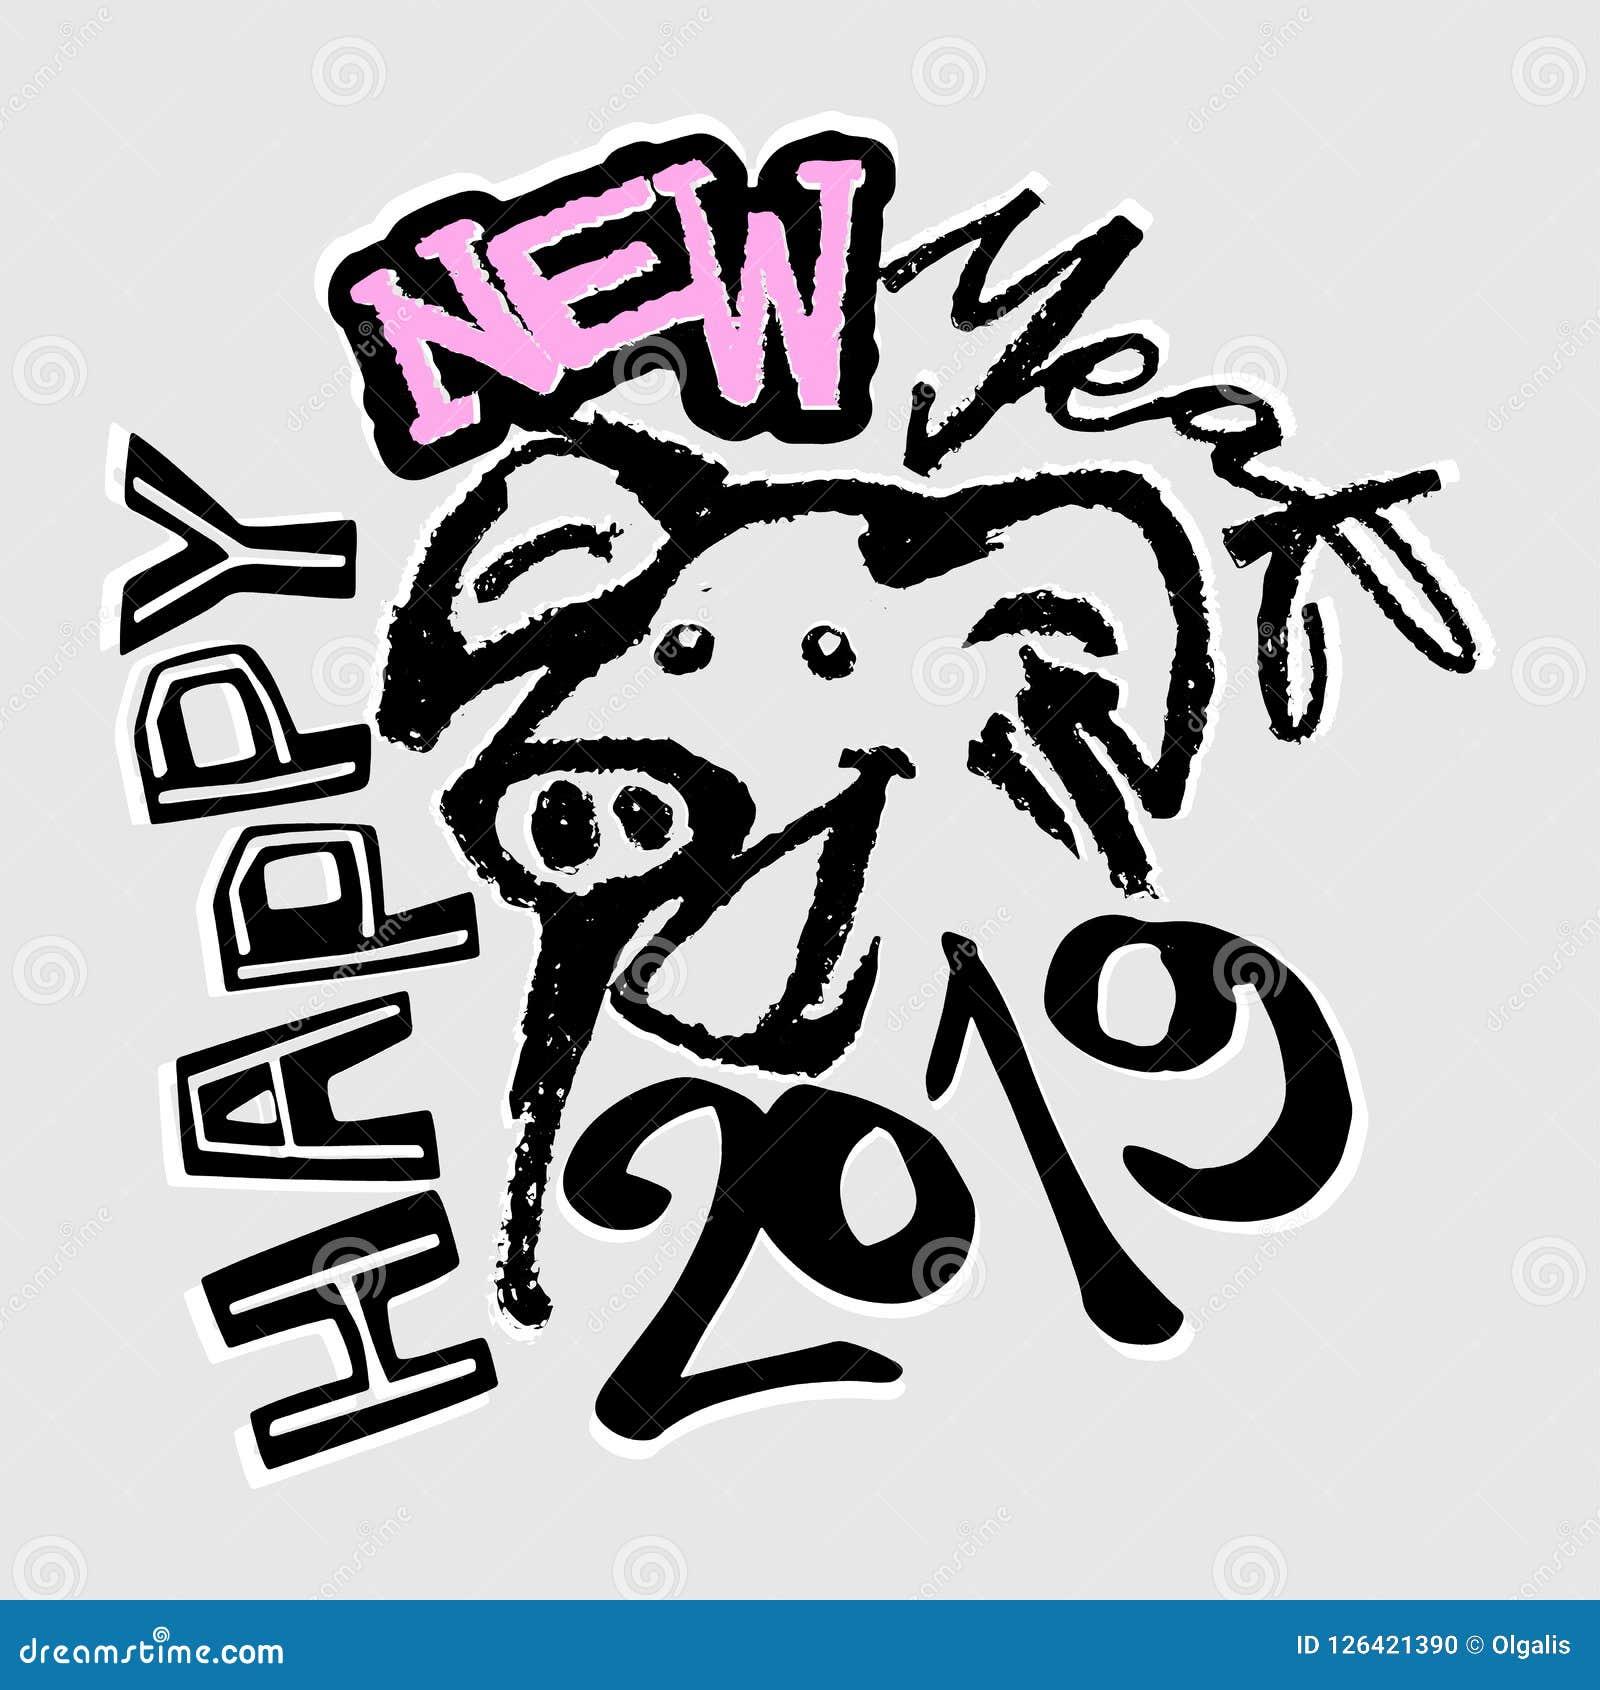 Год знака зодиака 2019 китайцев печати свиньи в стиле фанк